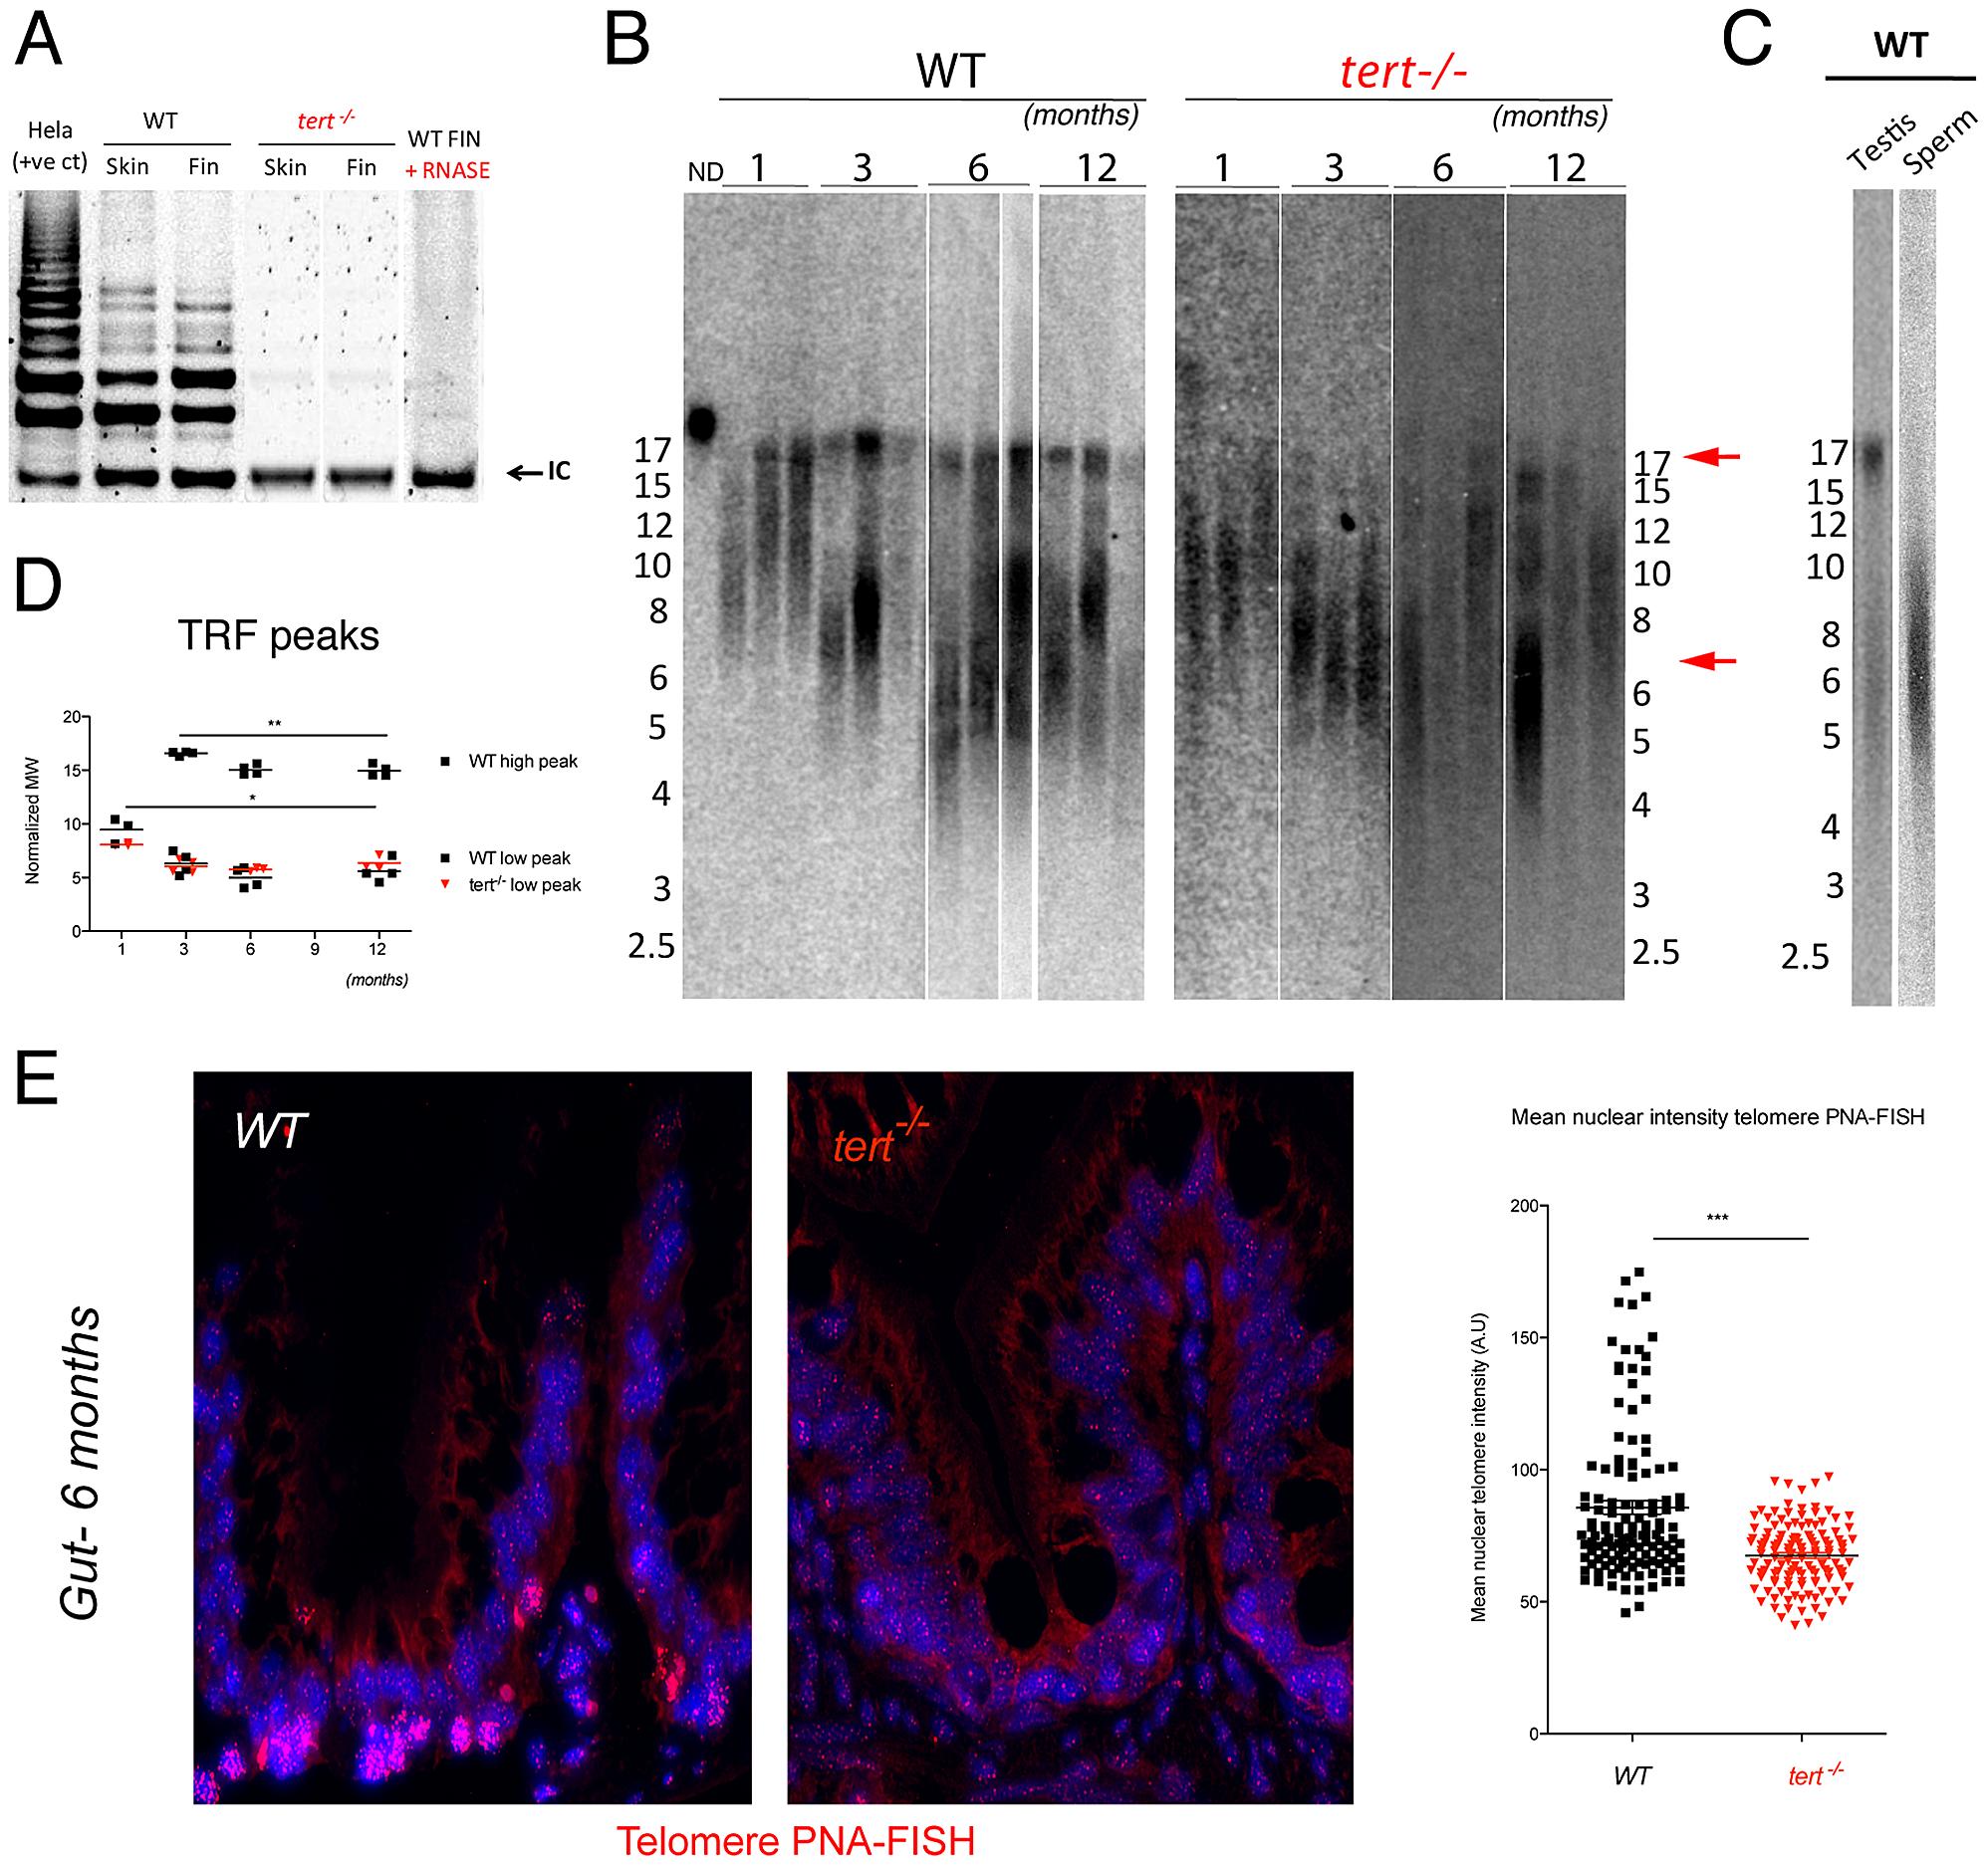 Telomerase mutant zebrafish have shorter telomeres than WT siblings.